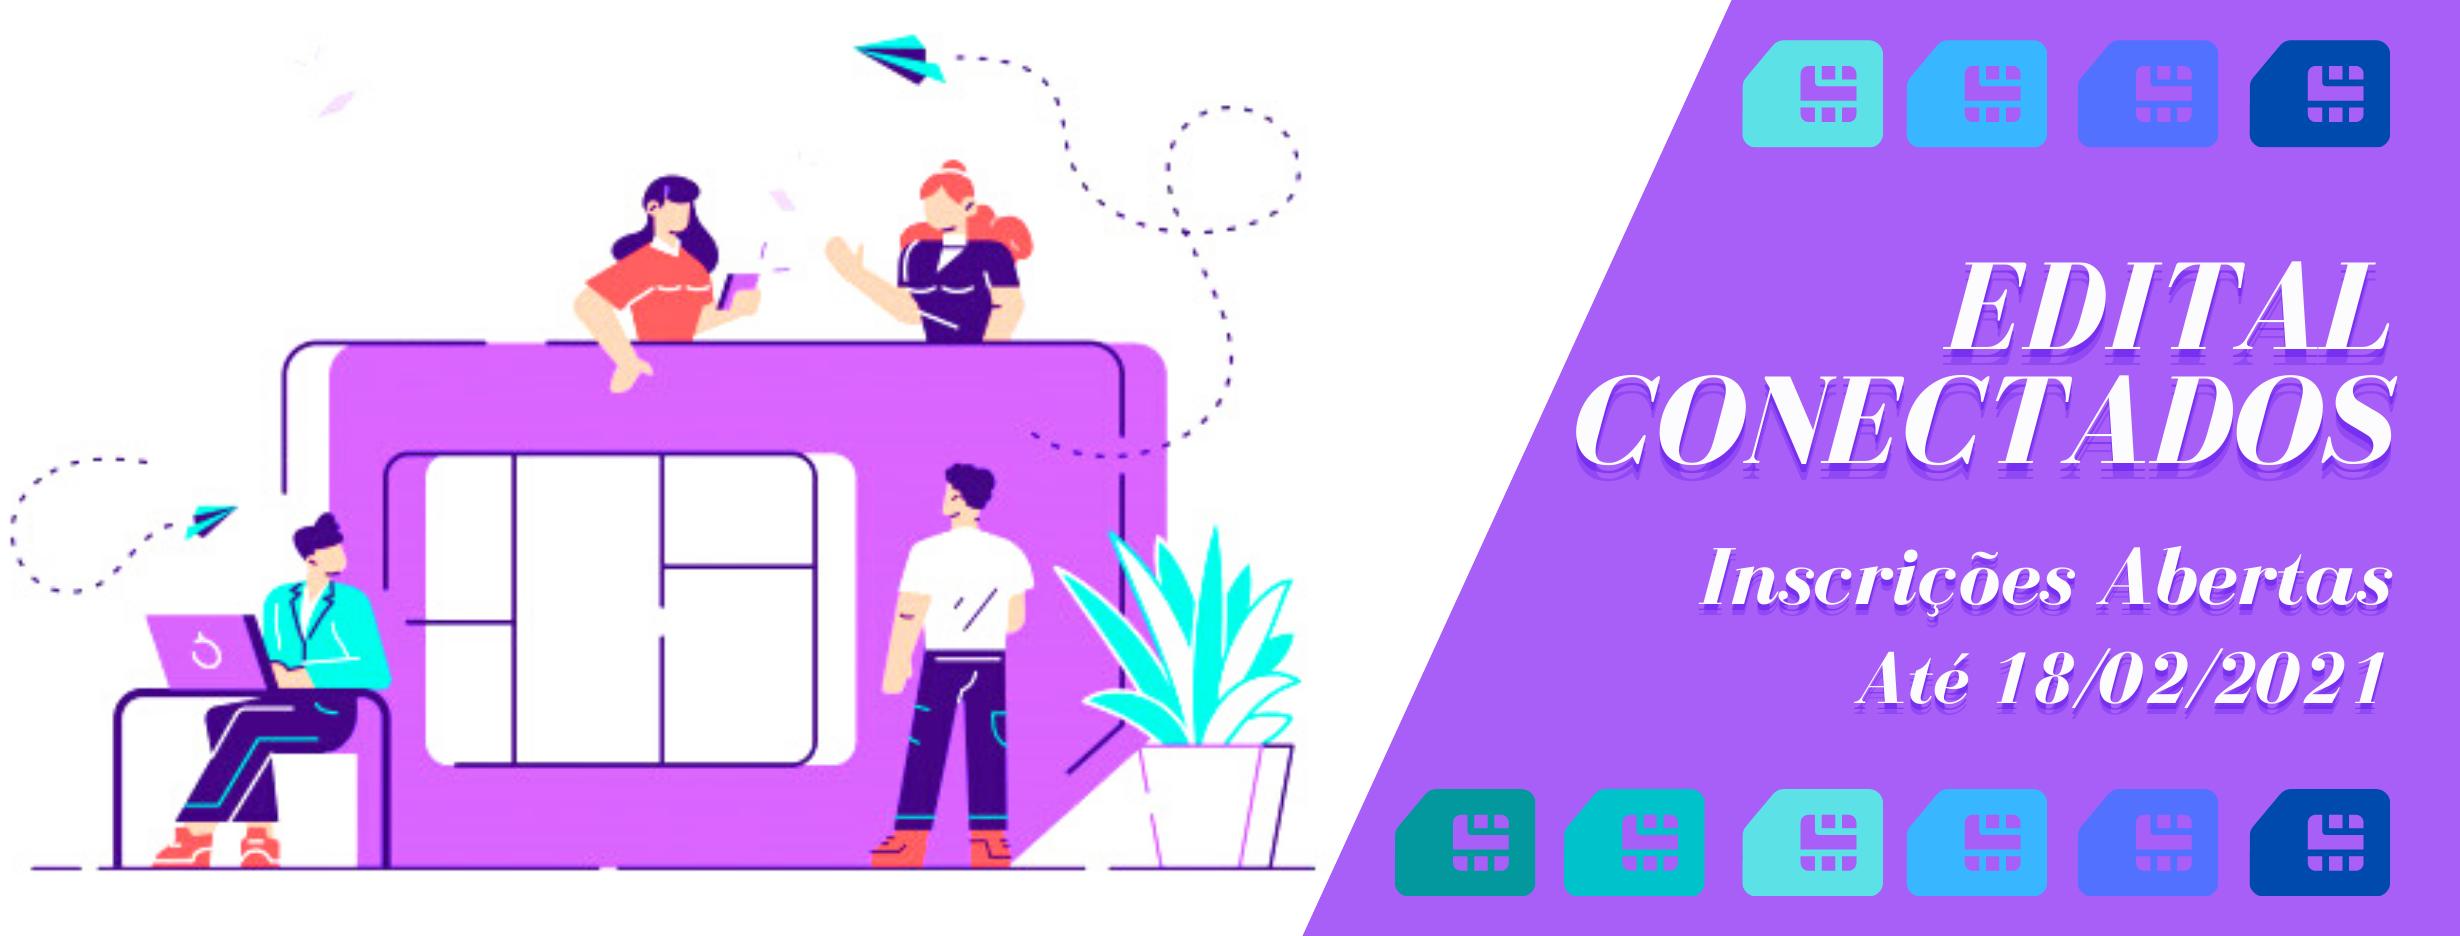 Edital Conectados 2021